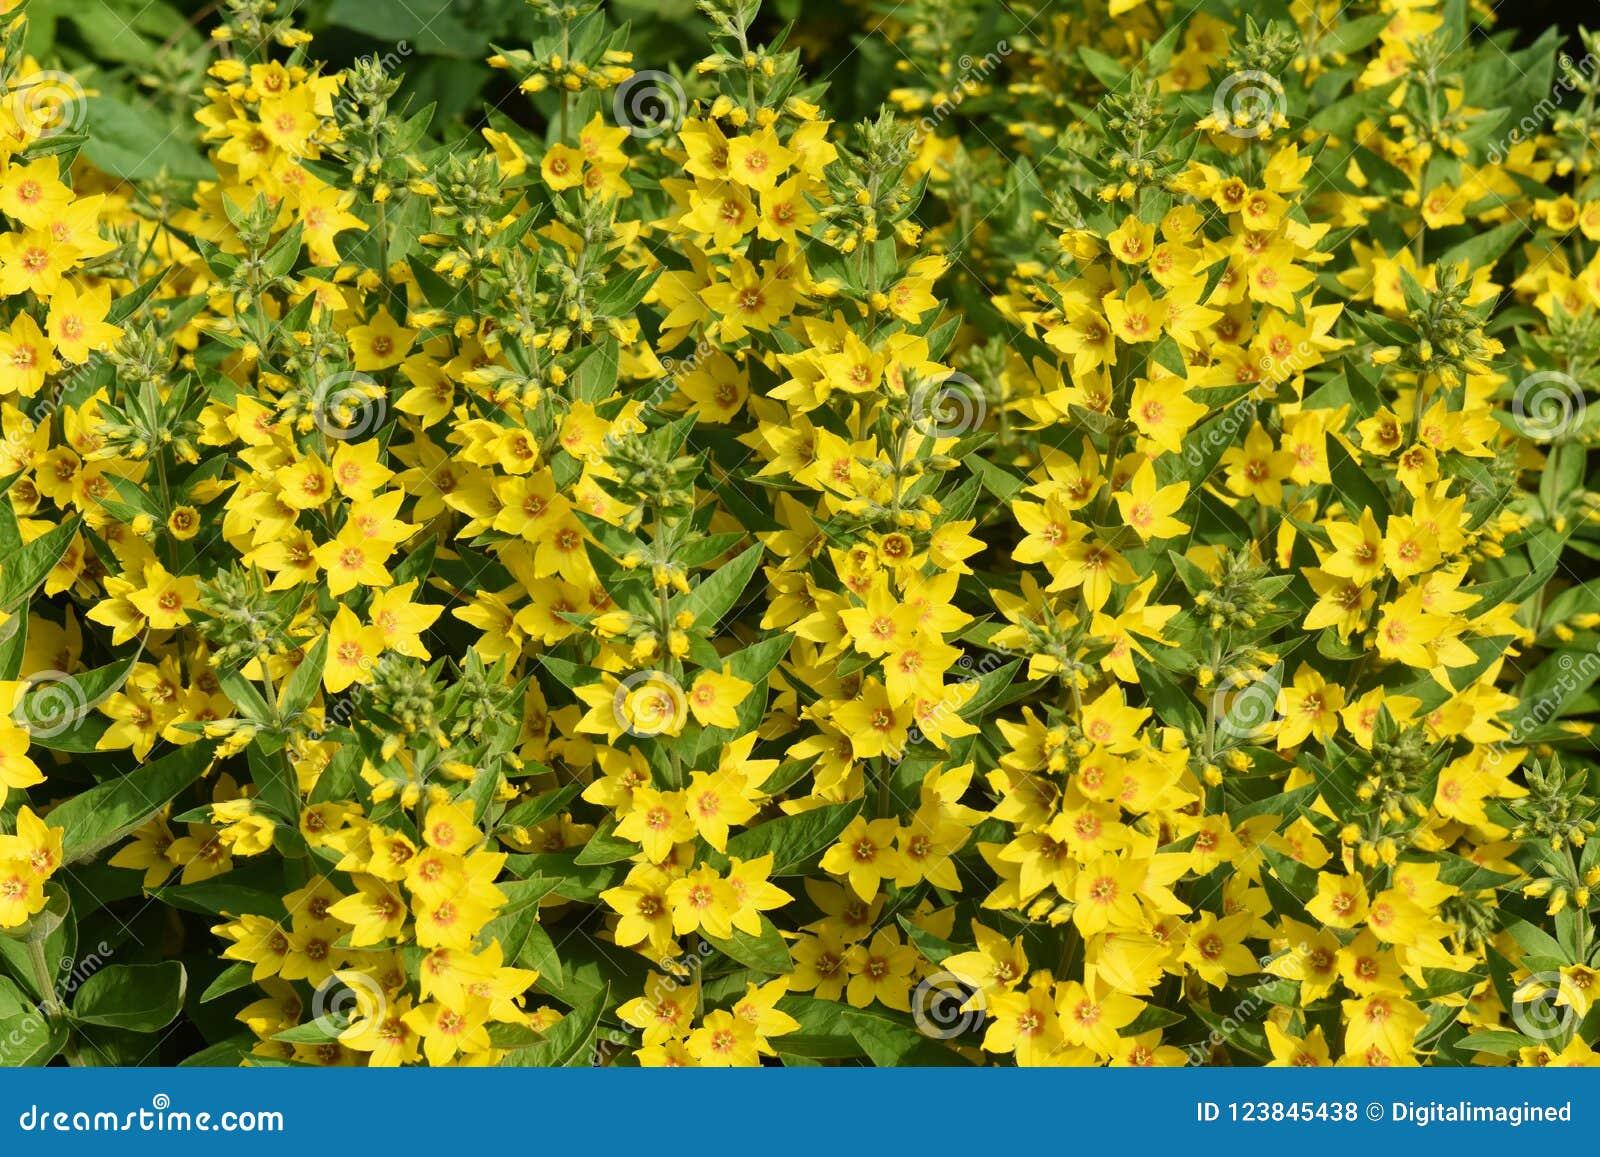 Invasive Garden Plant Yellow Loosestrife Lysimachia Vulgaris Stock